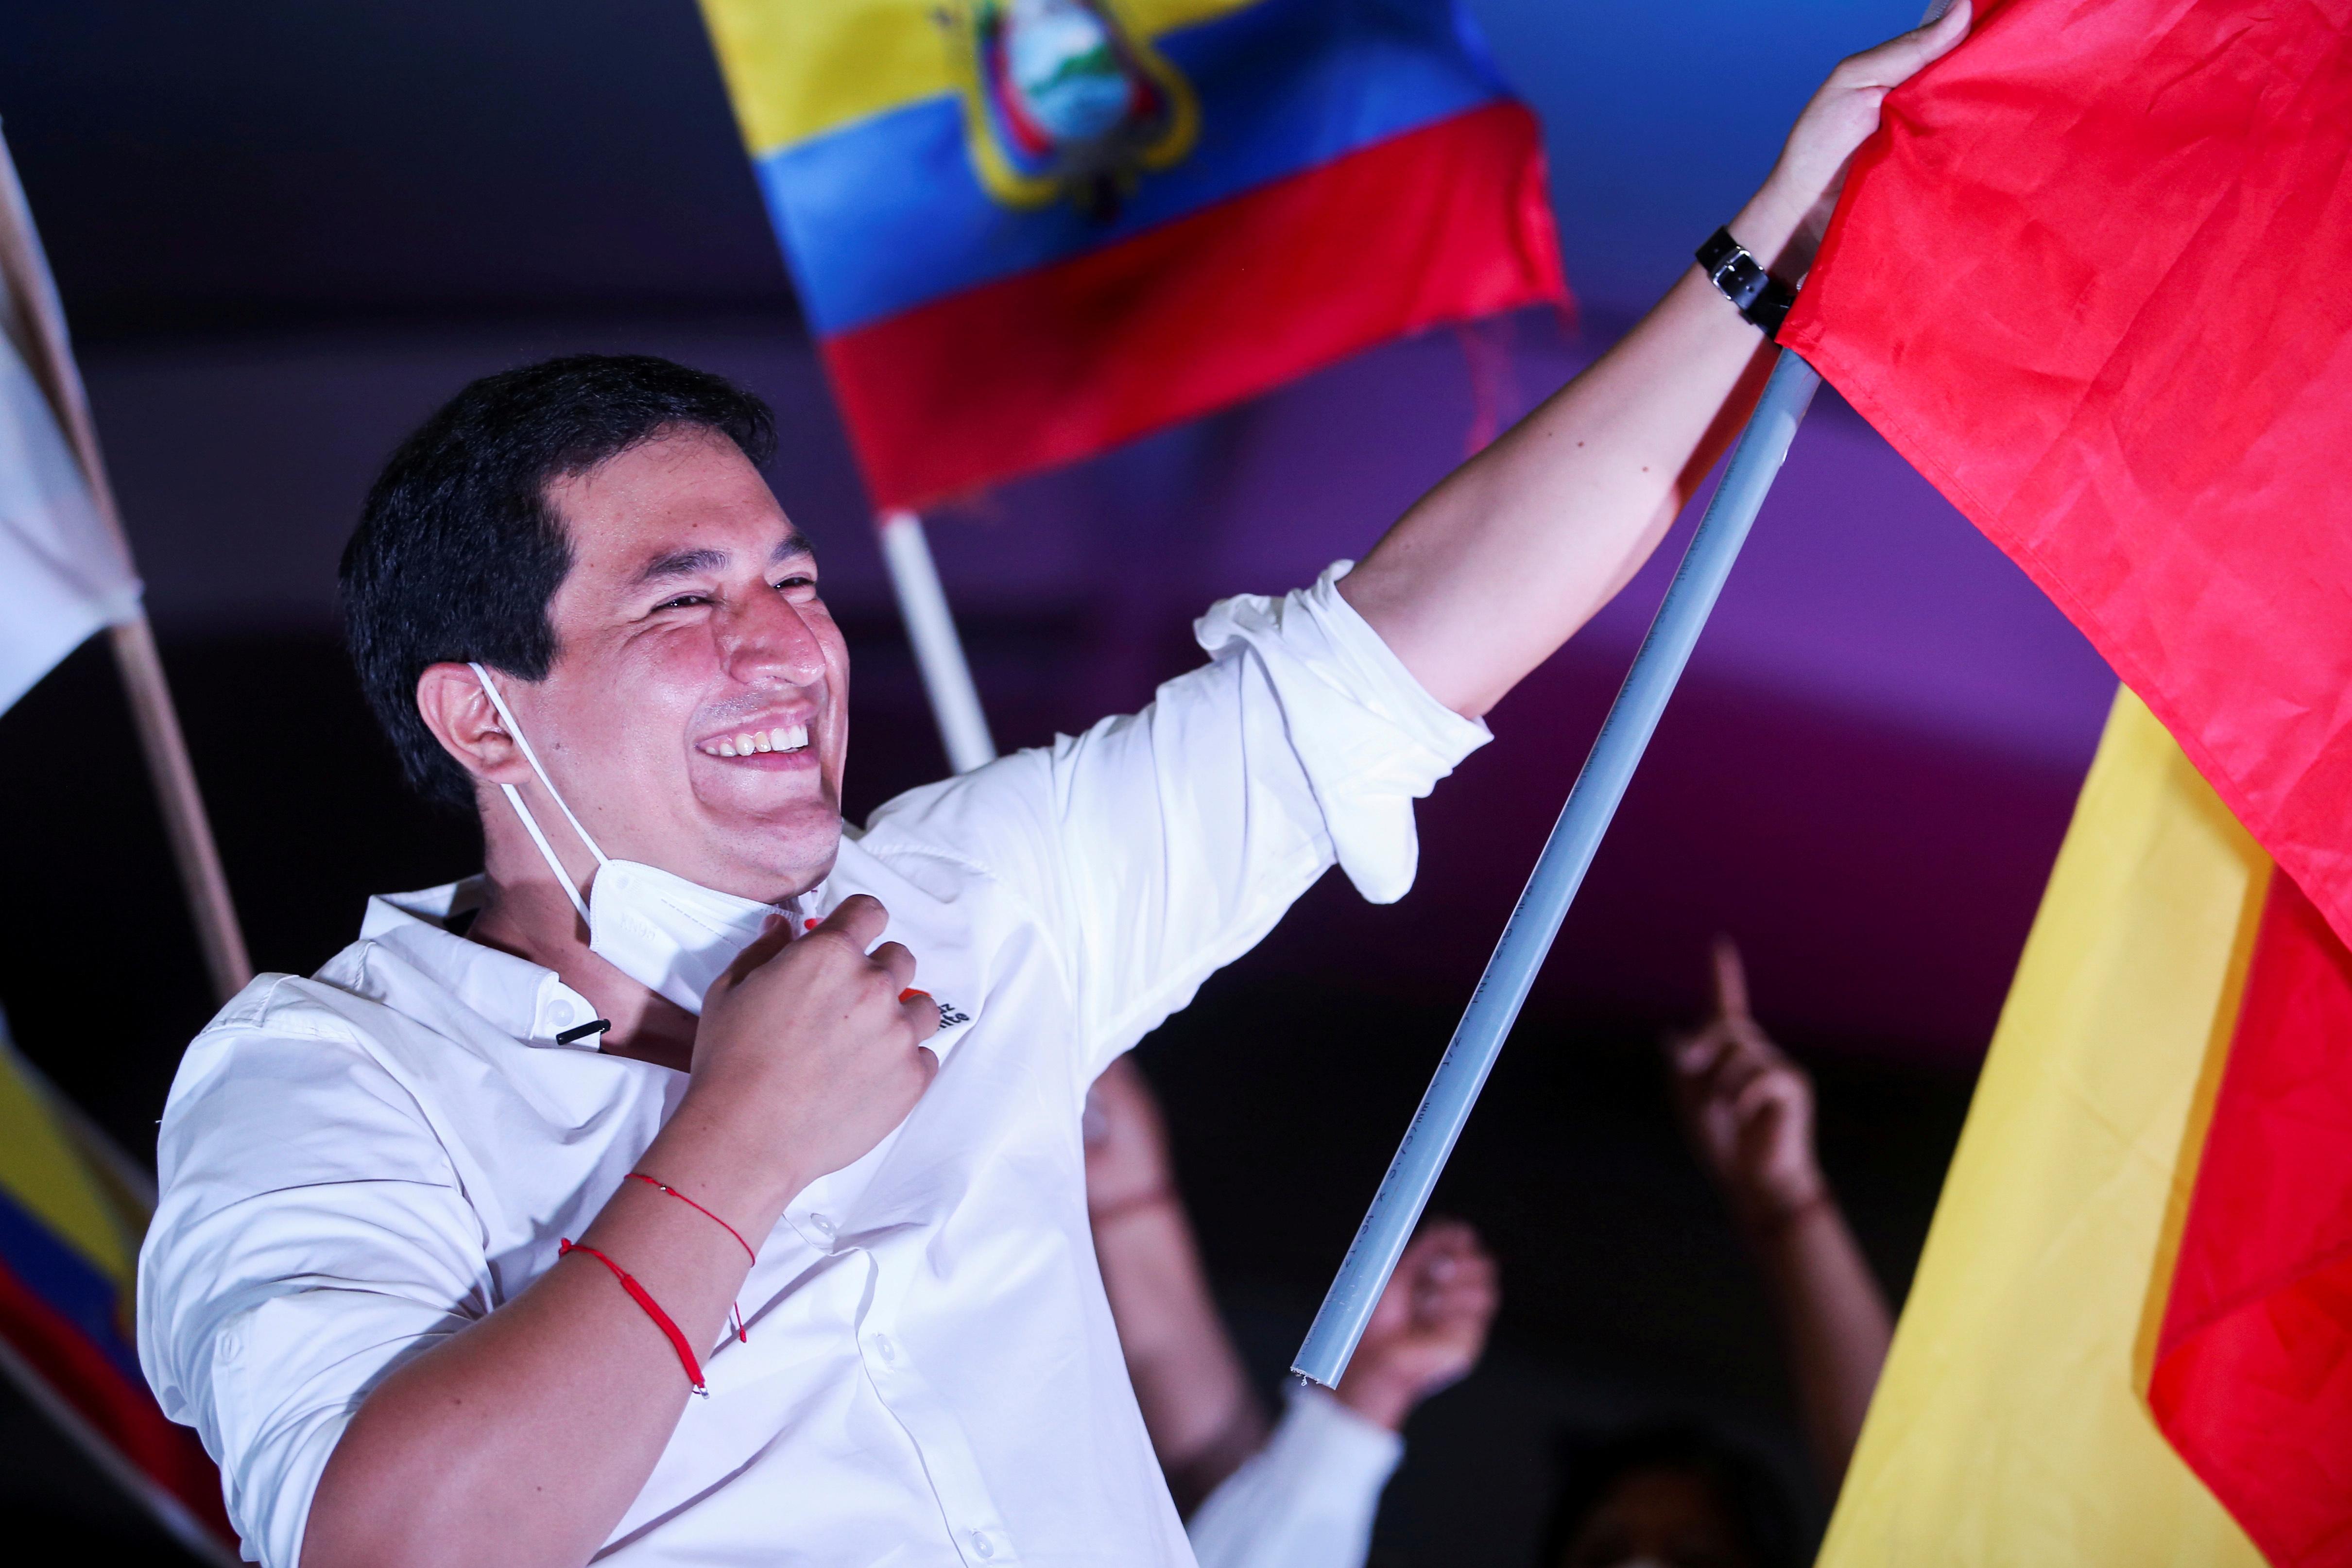 Ecuador's presidential candidate Andres Arauz attends a closing campaign rally in Quito, Ecuador April 8, 2021. REUTERS/Luisa Gonzalez/File Photo